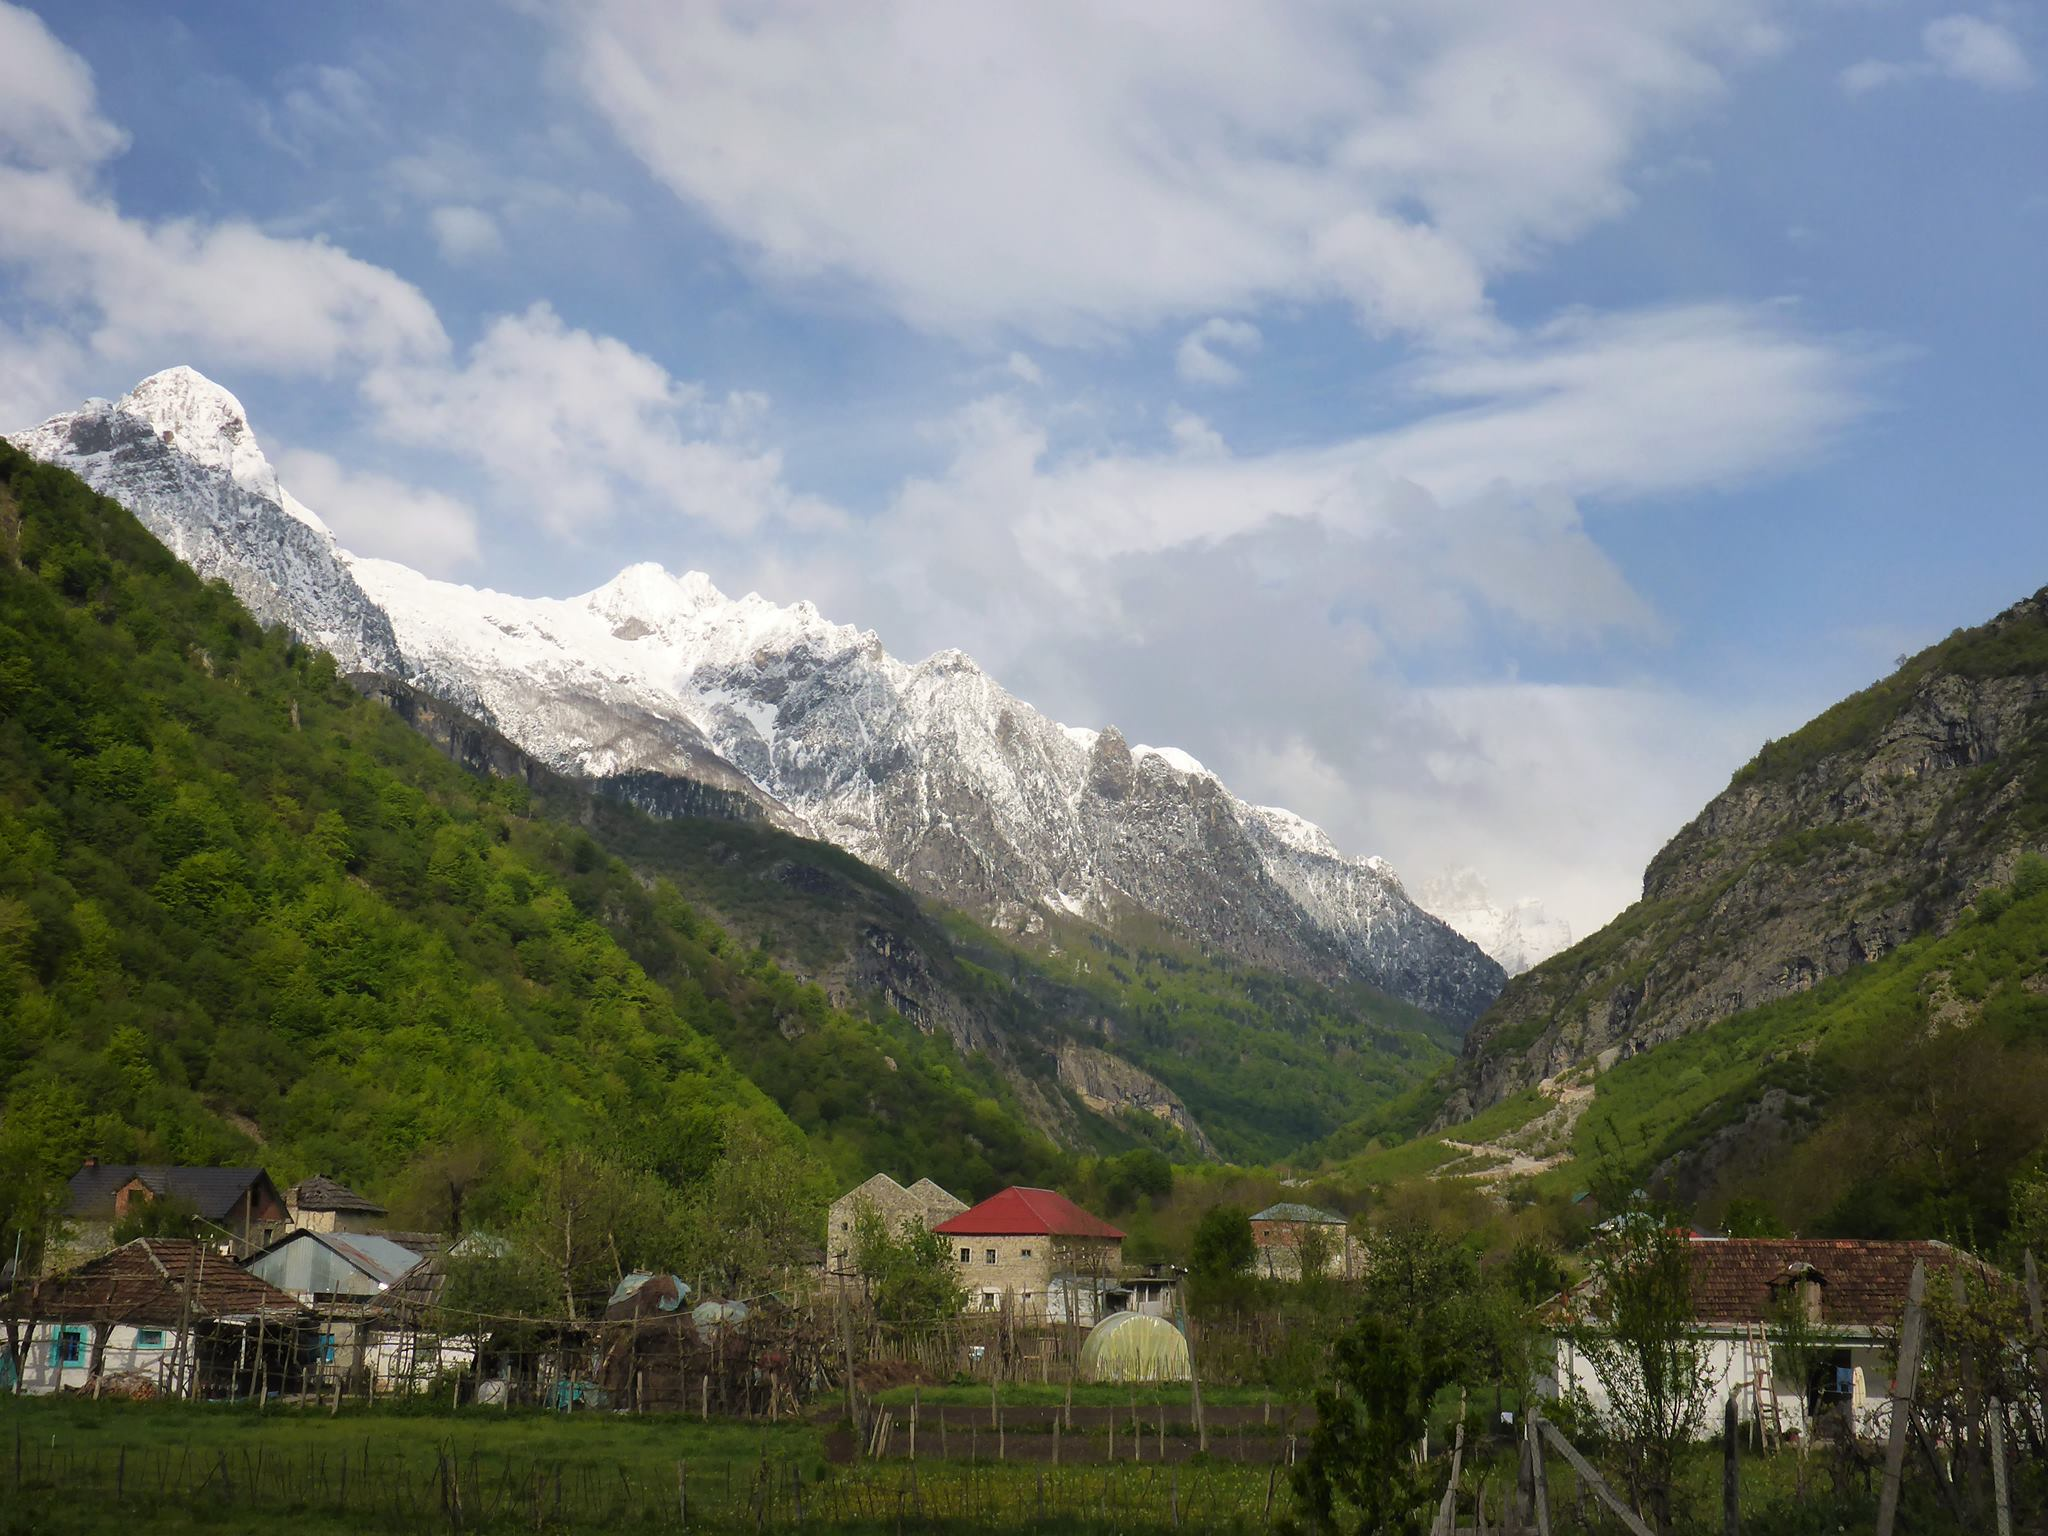 La vallée de Valbona